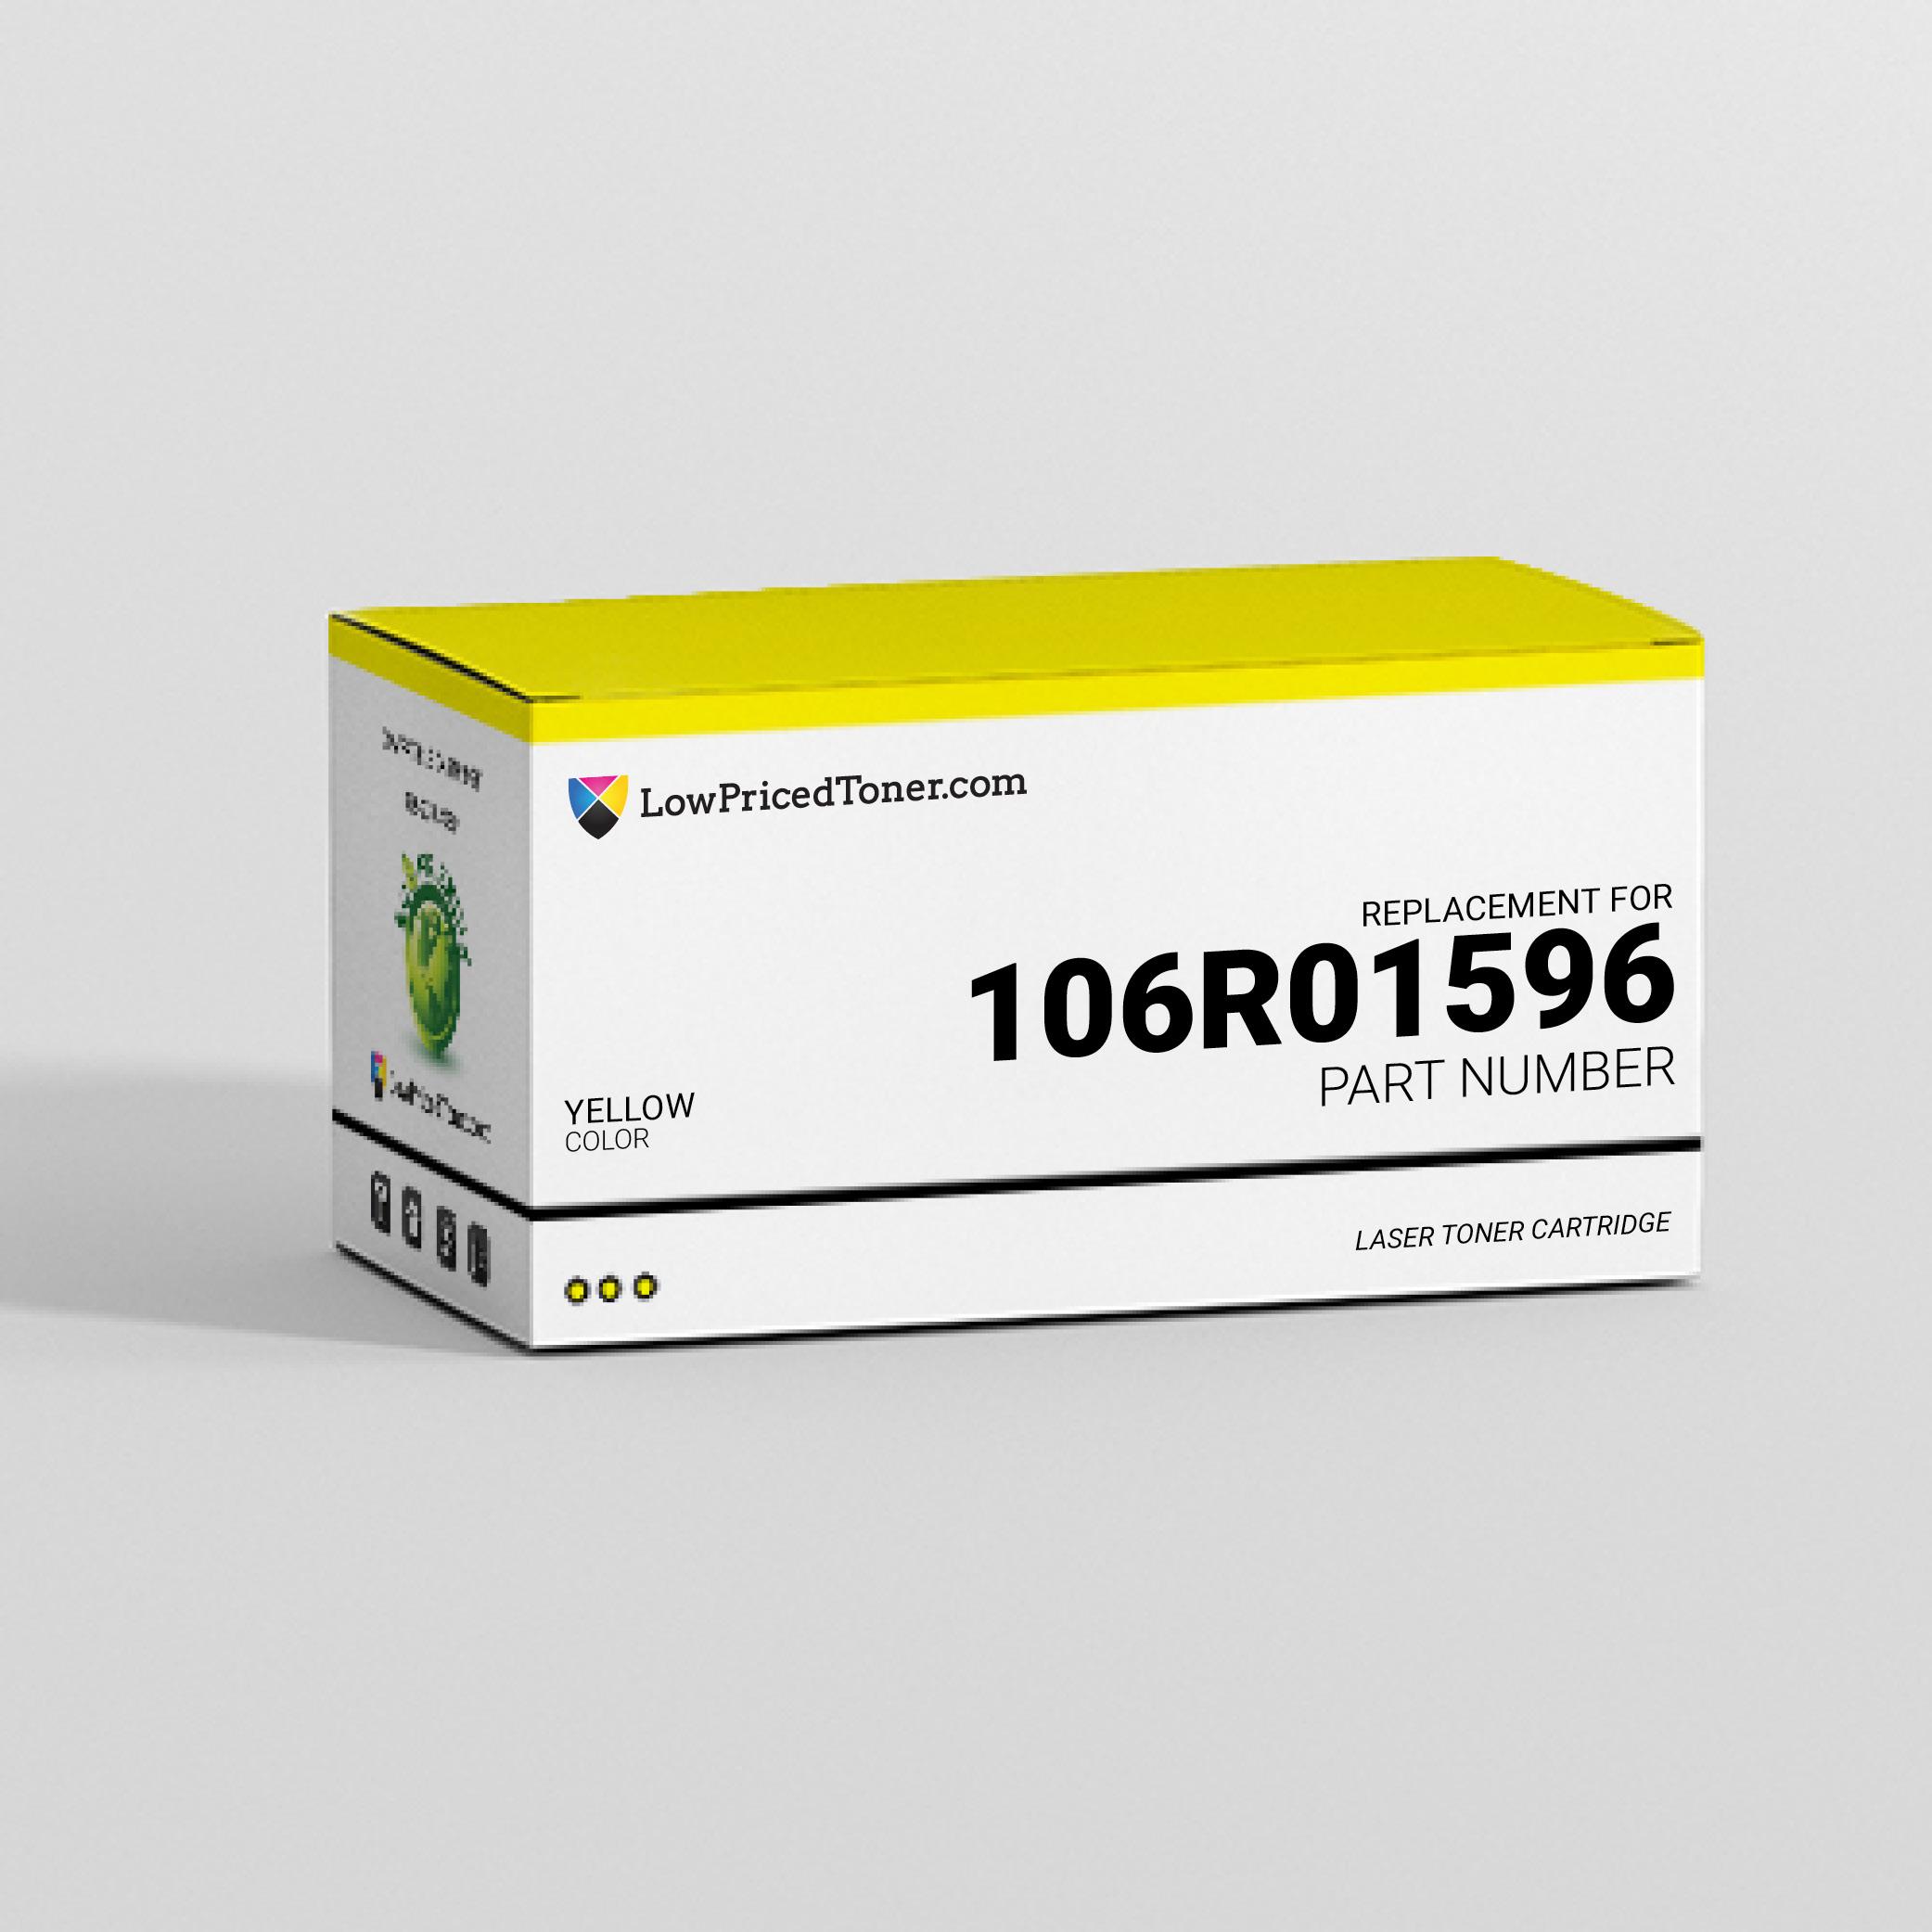 Xerox 106R01596 Compatible Yellow Laser Toner Cartridge